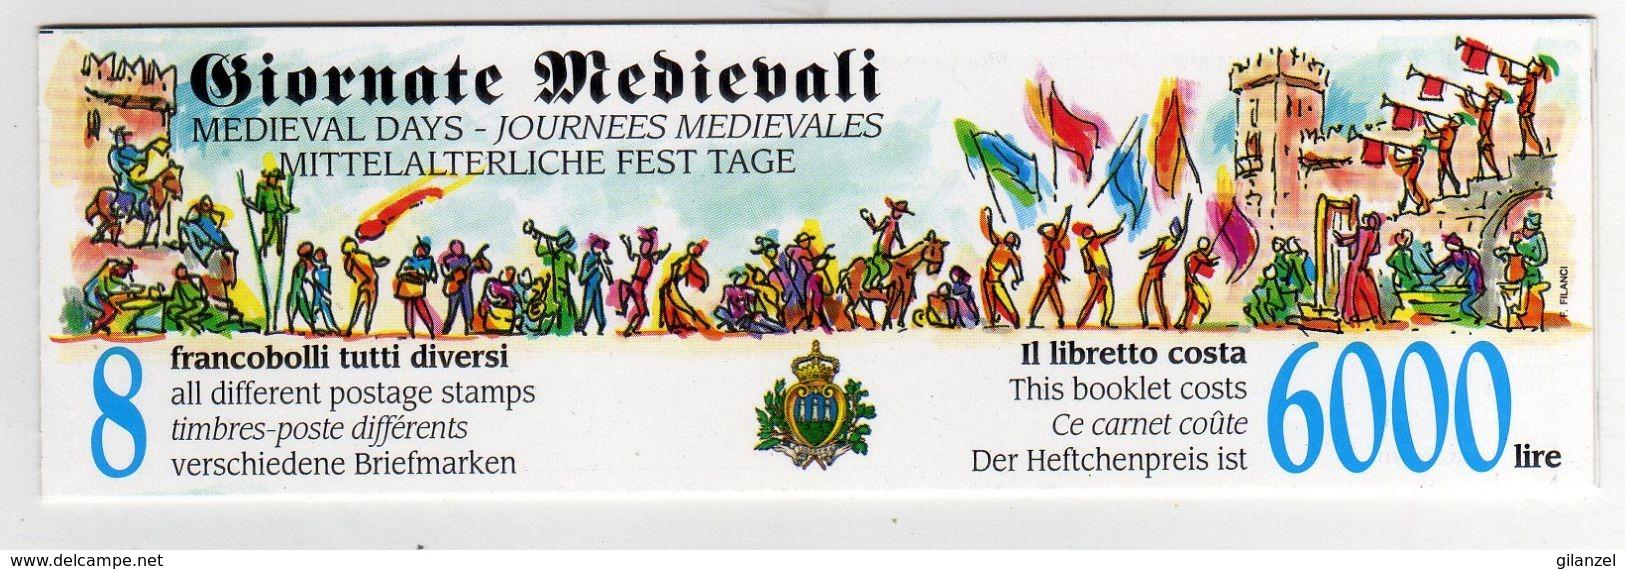 San Marino 1996 Libretto Carnet Giornate Medievali Mittelalterliche Fest Tage Medievals Days - Stamps